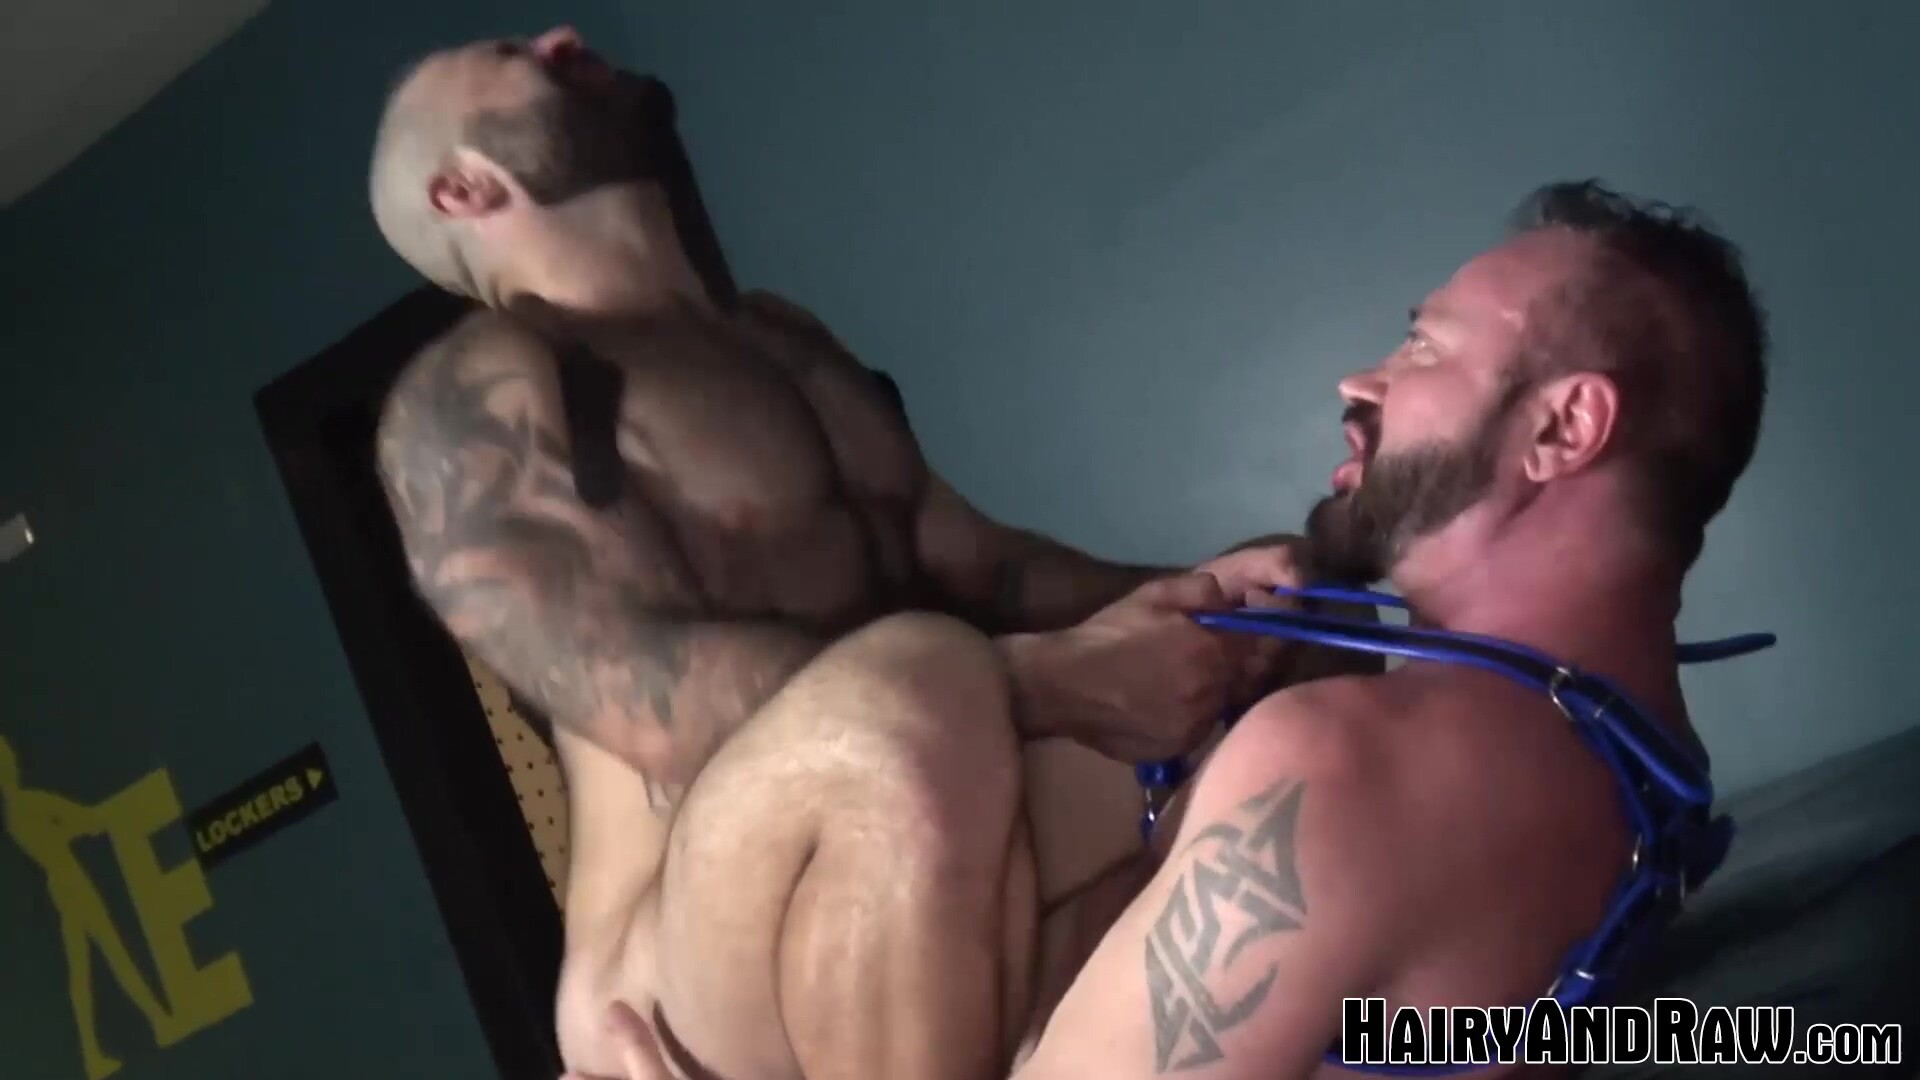 HAIRYANDRAW Muscular Pig Atlas Grant Rides Hung Daddy Raw